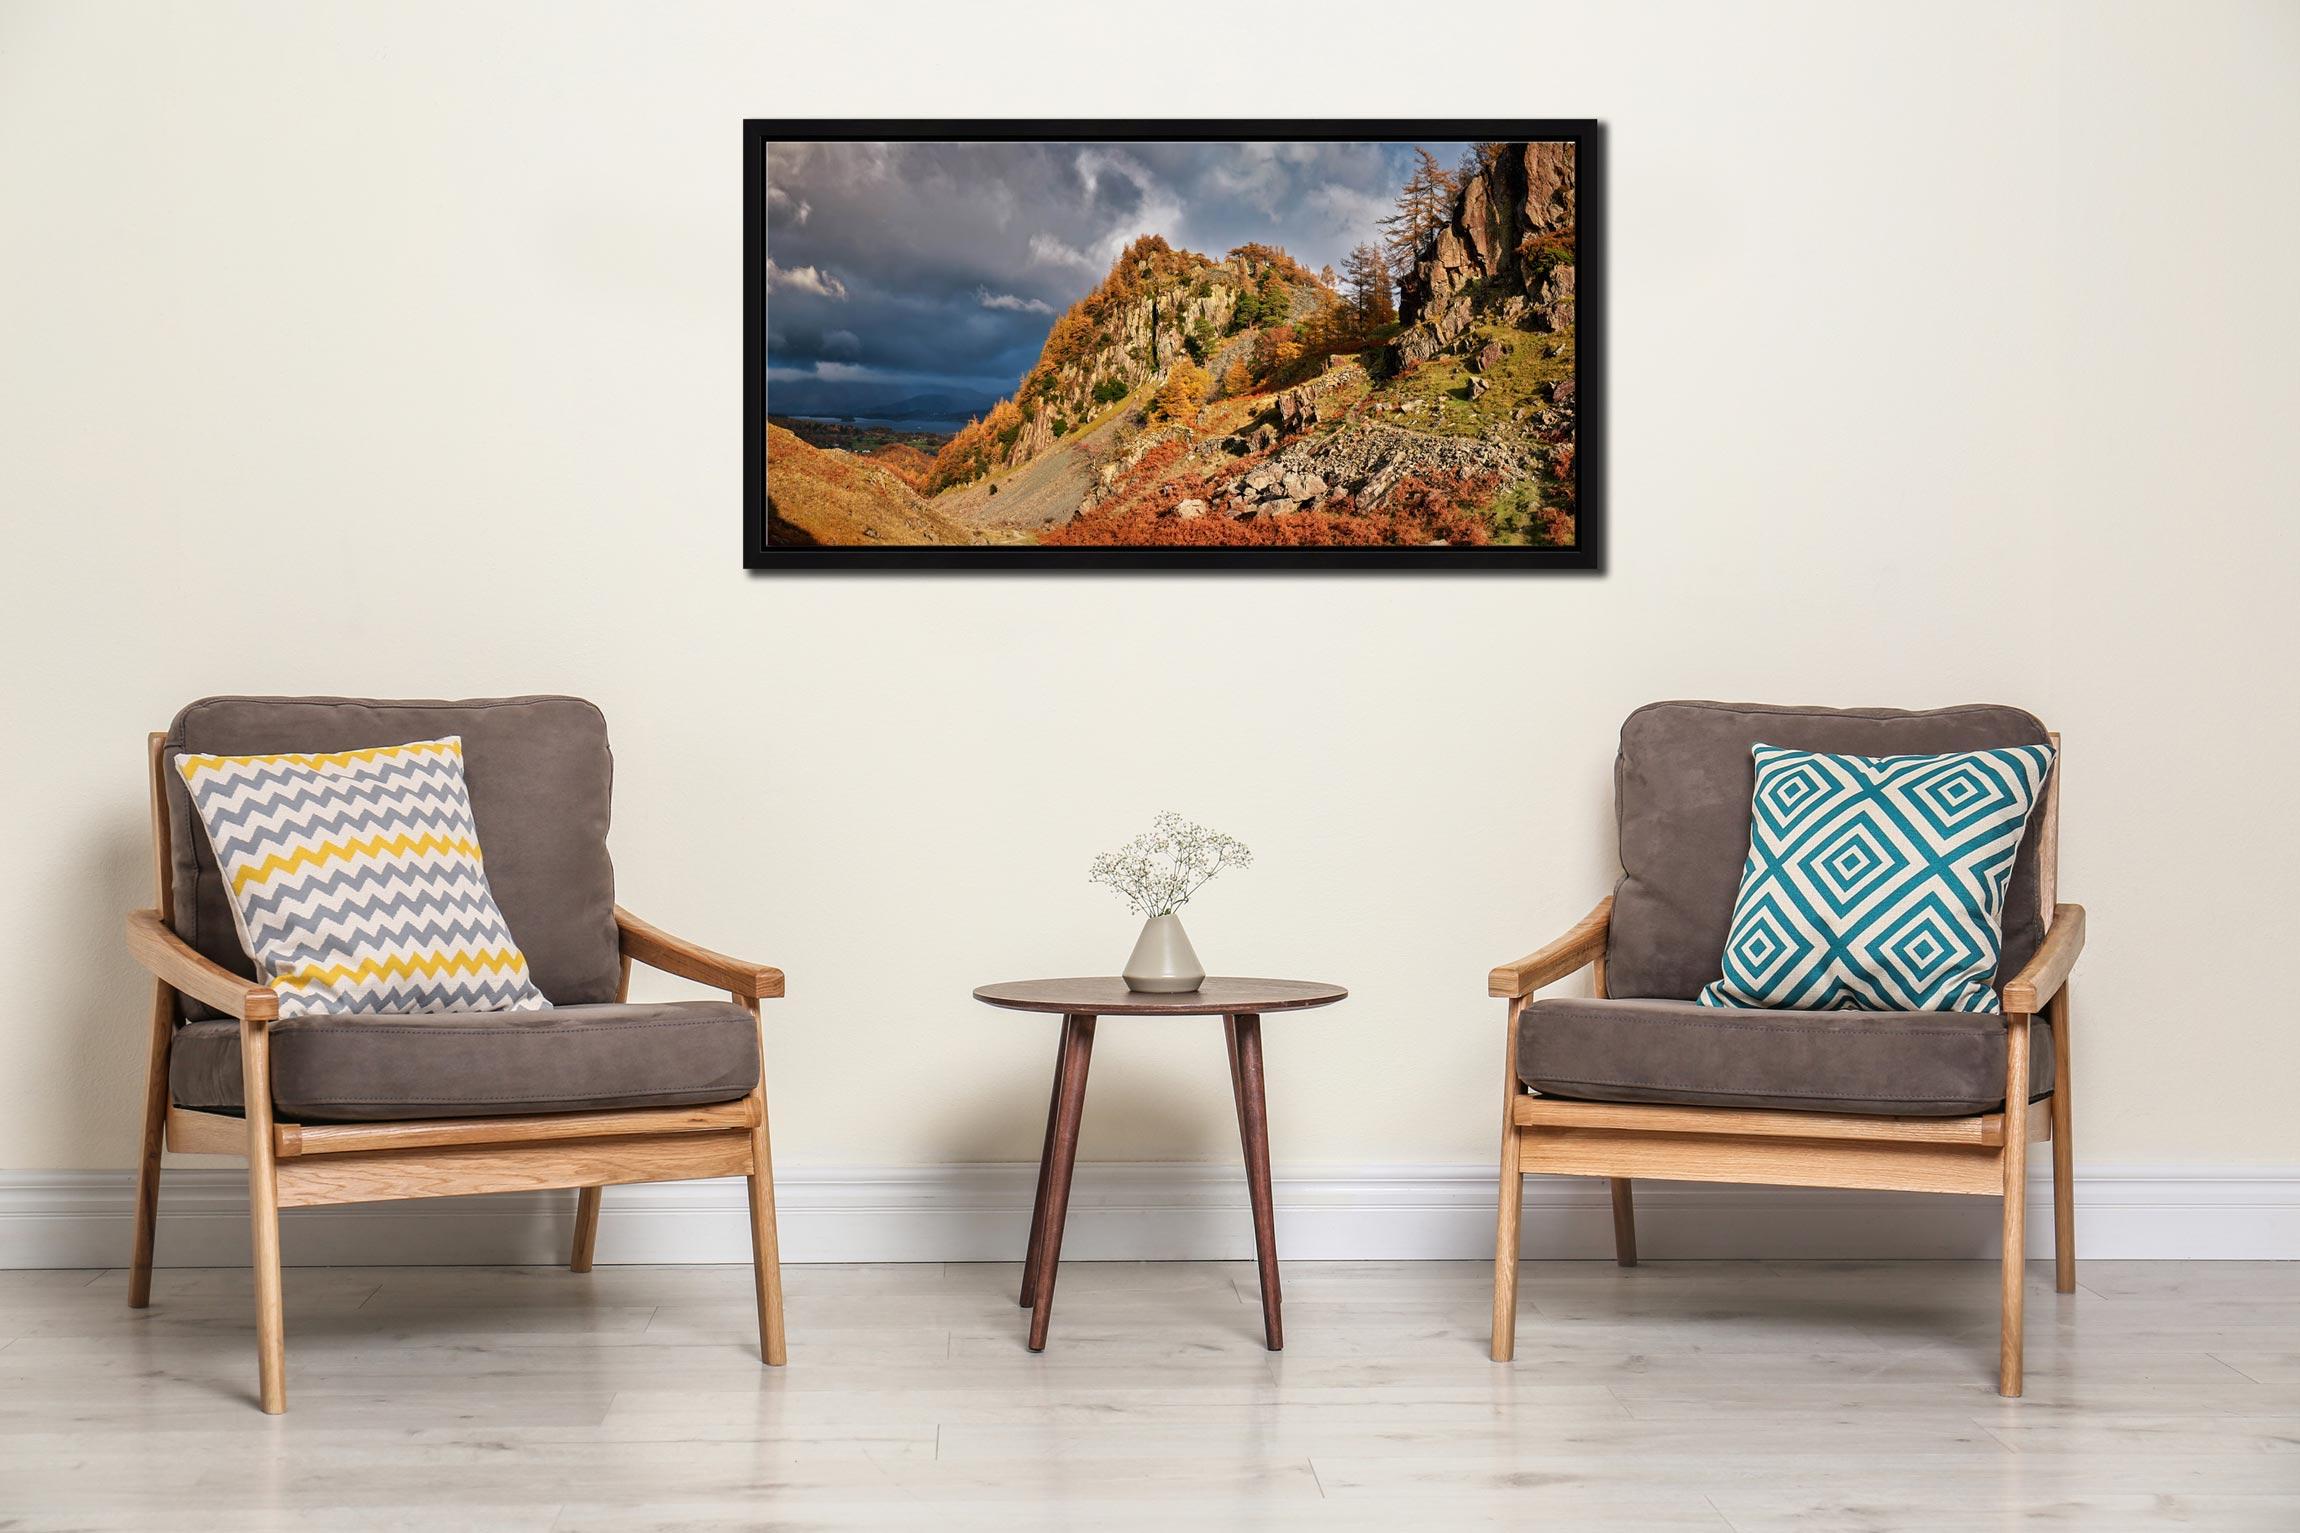 Castle Crag Autumn Sunshine - Black oak floater frame with acrylic glazing on Wall